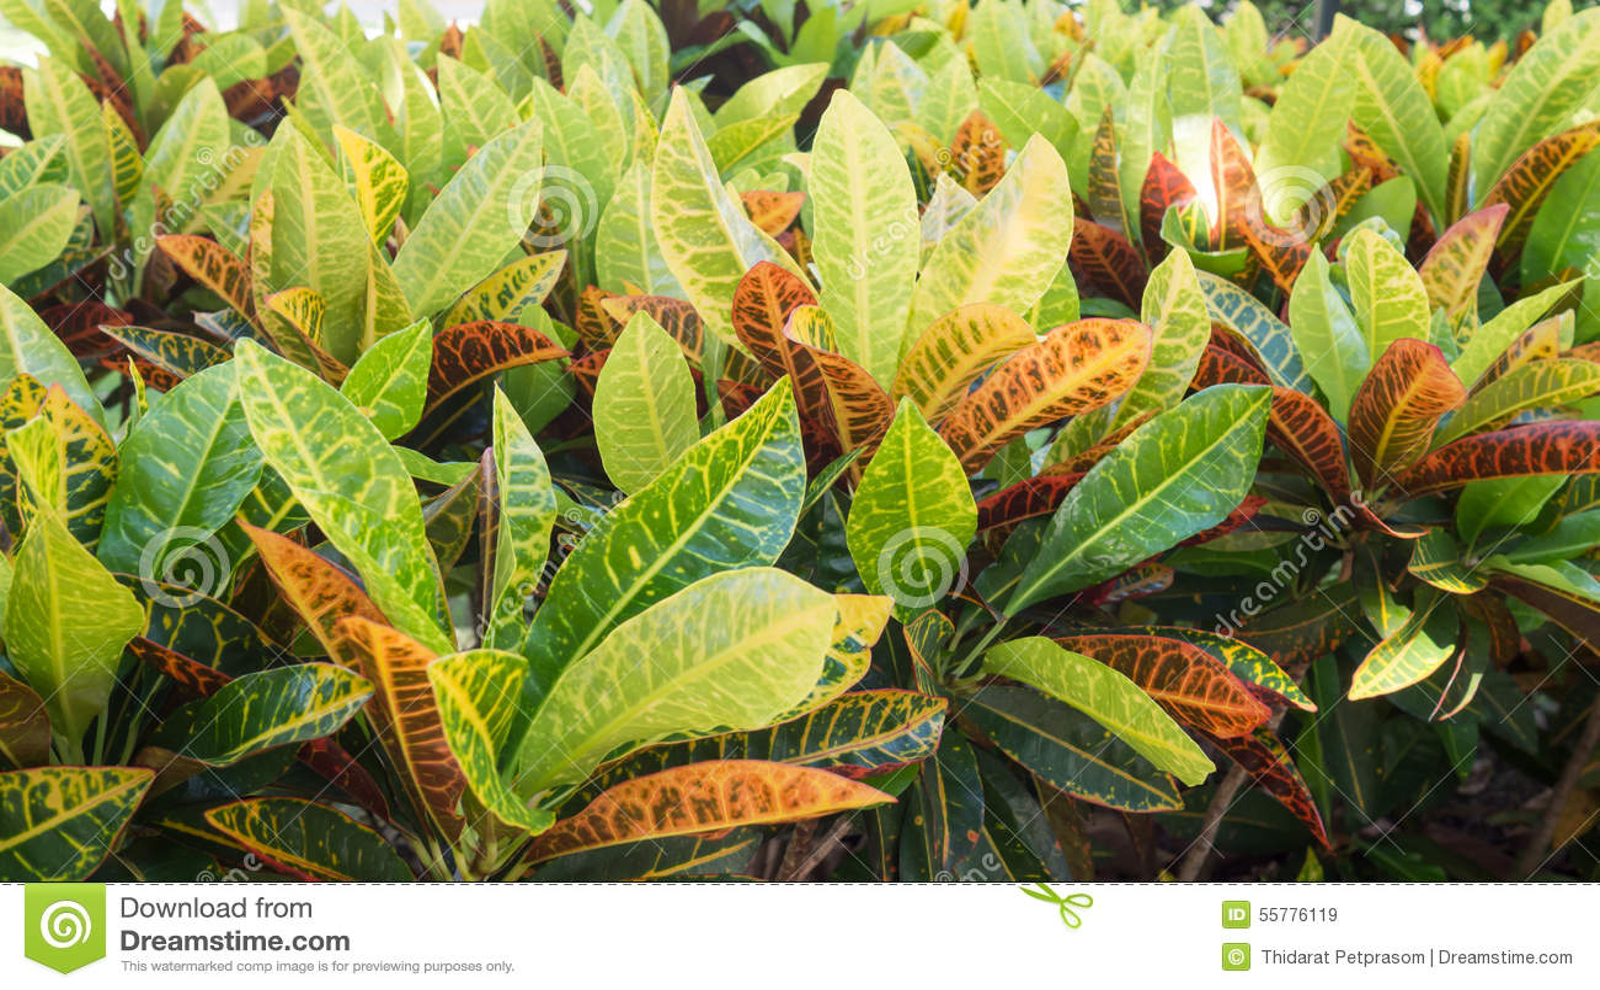 Closeup leaves of Codiaeum variegatum or Garden Croton Petra in Garden as background